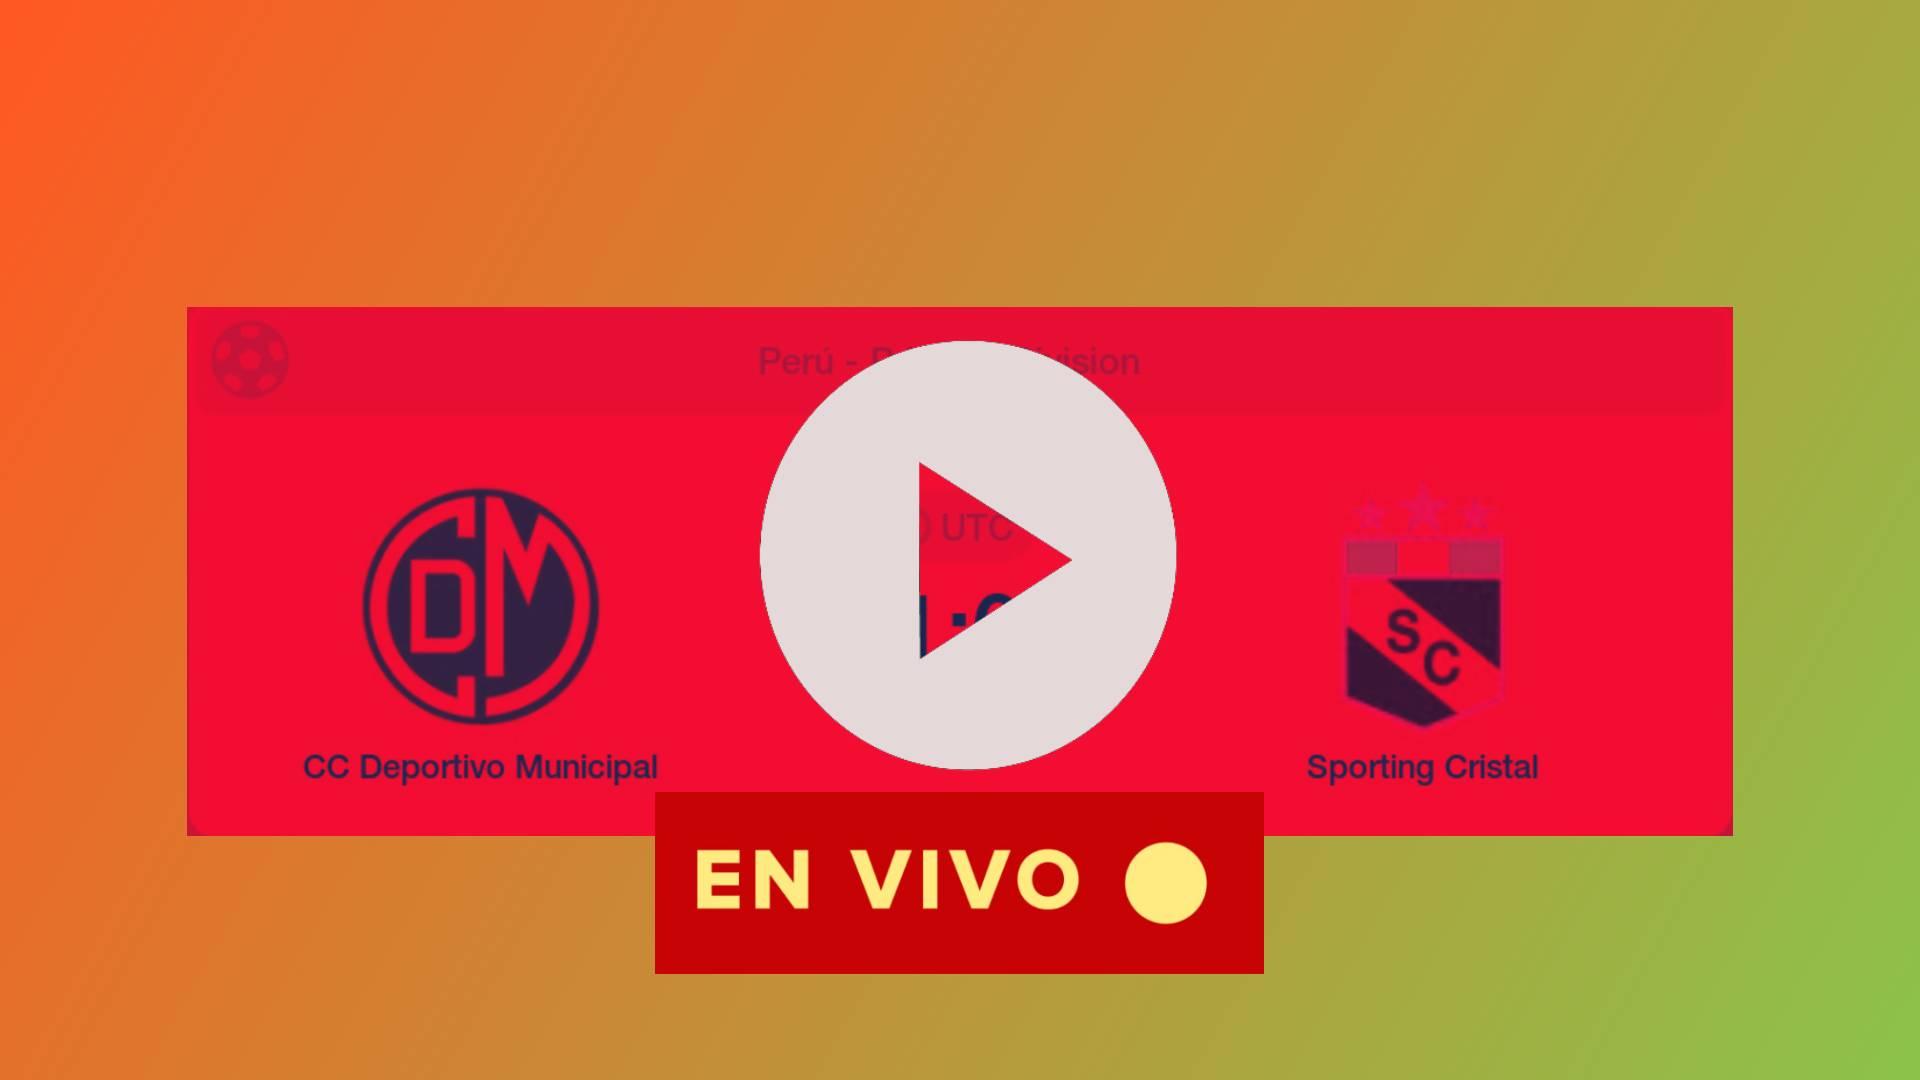 GRATIS ONLINE Sporting Cristal vs Deportivo Municipal en directo